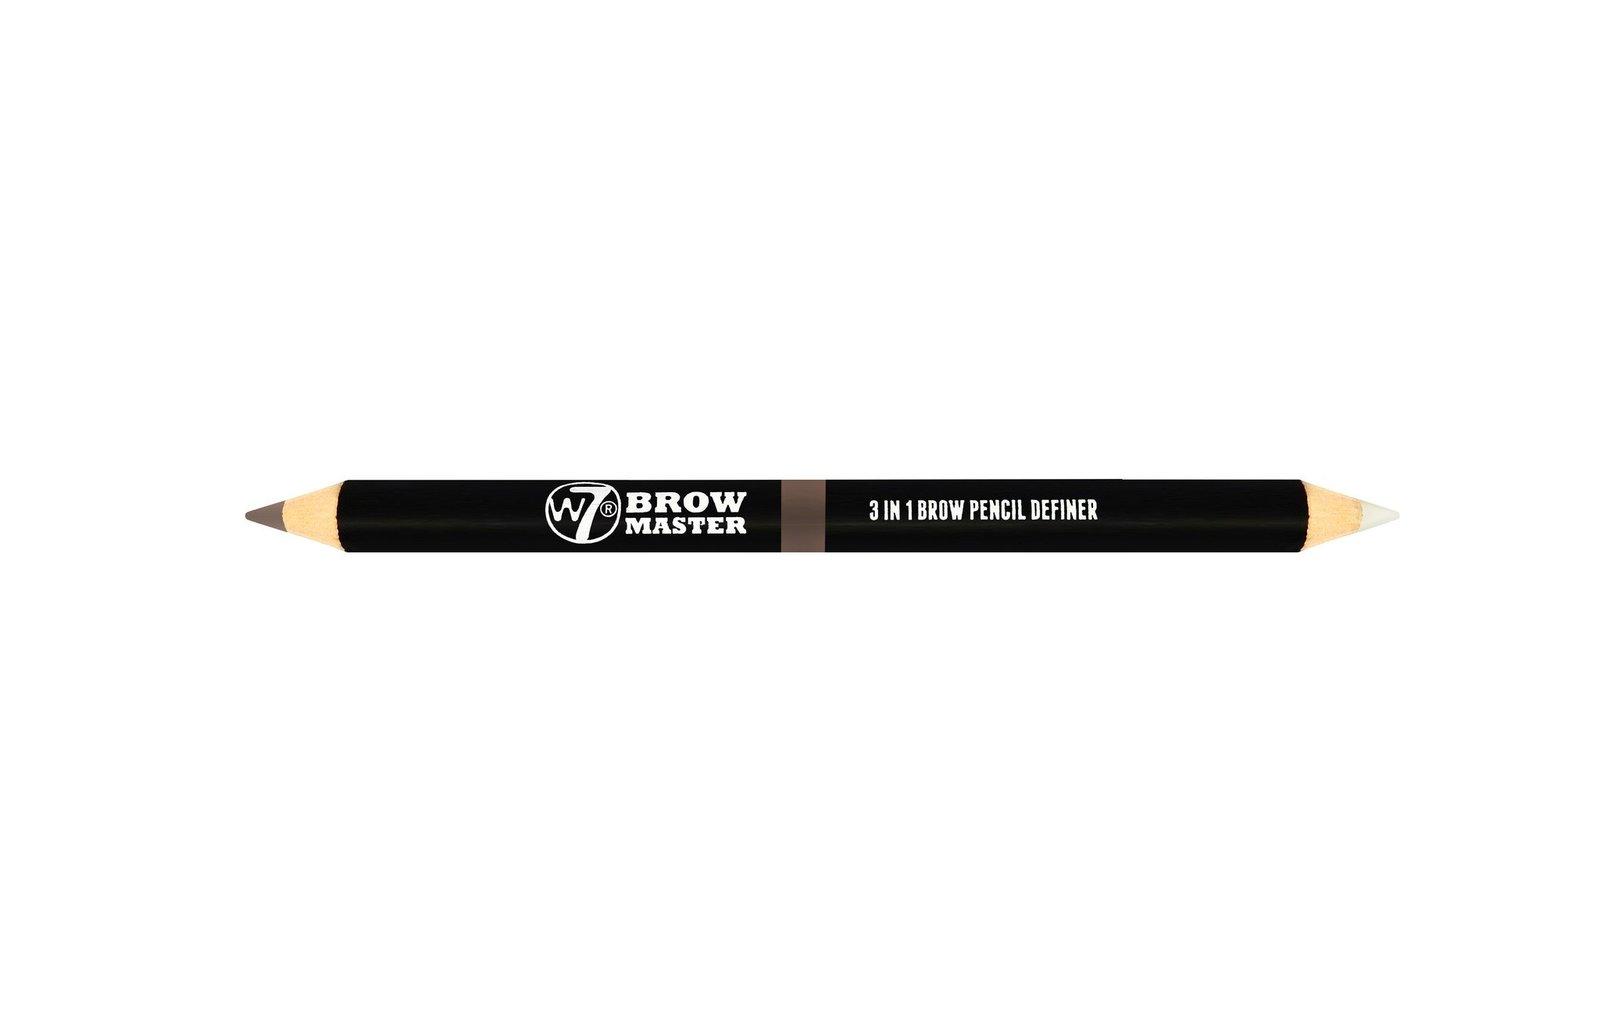 W7 Brow Master 3 in 1 Brow Pencil Definer (Blonde) image